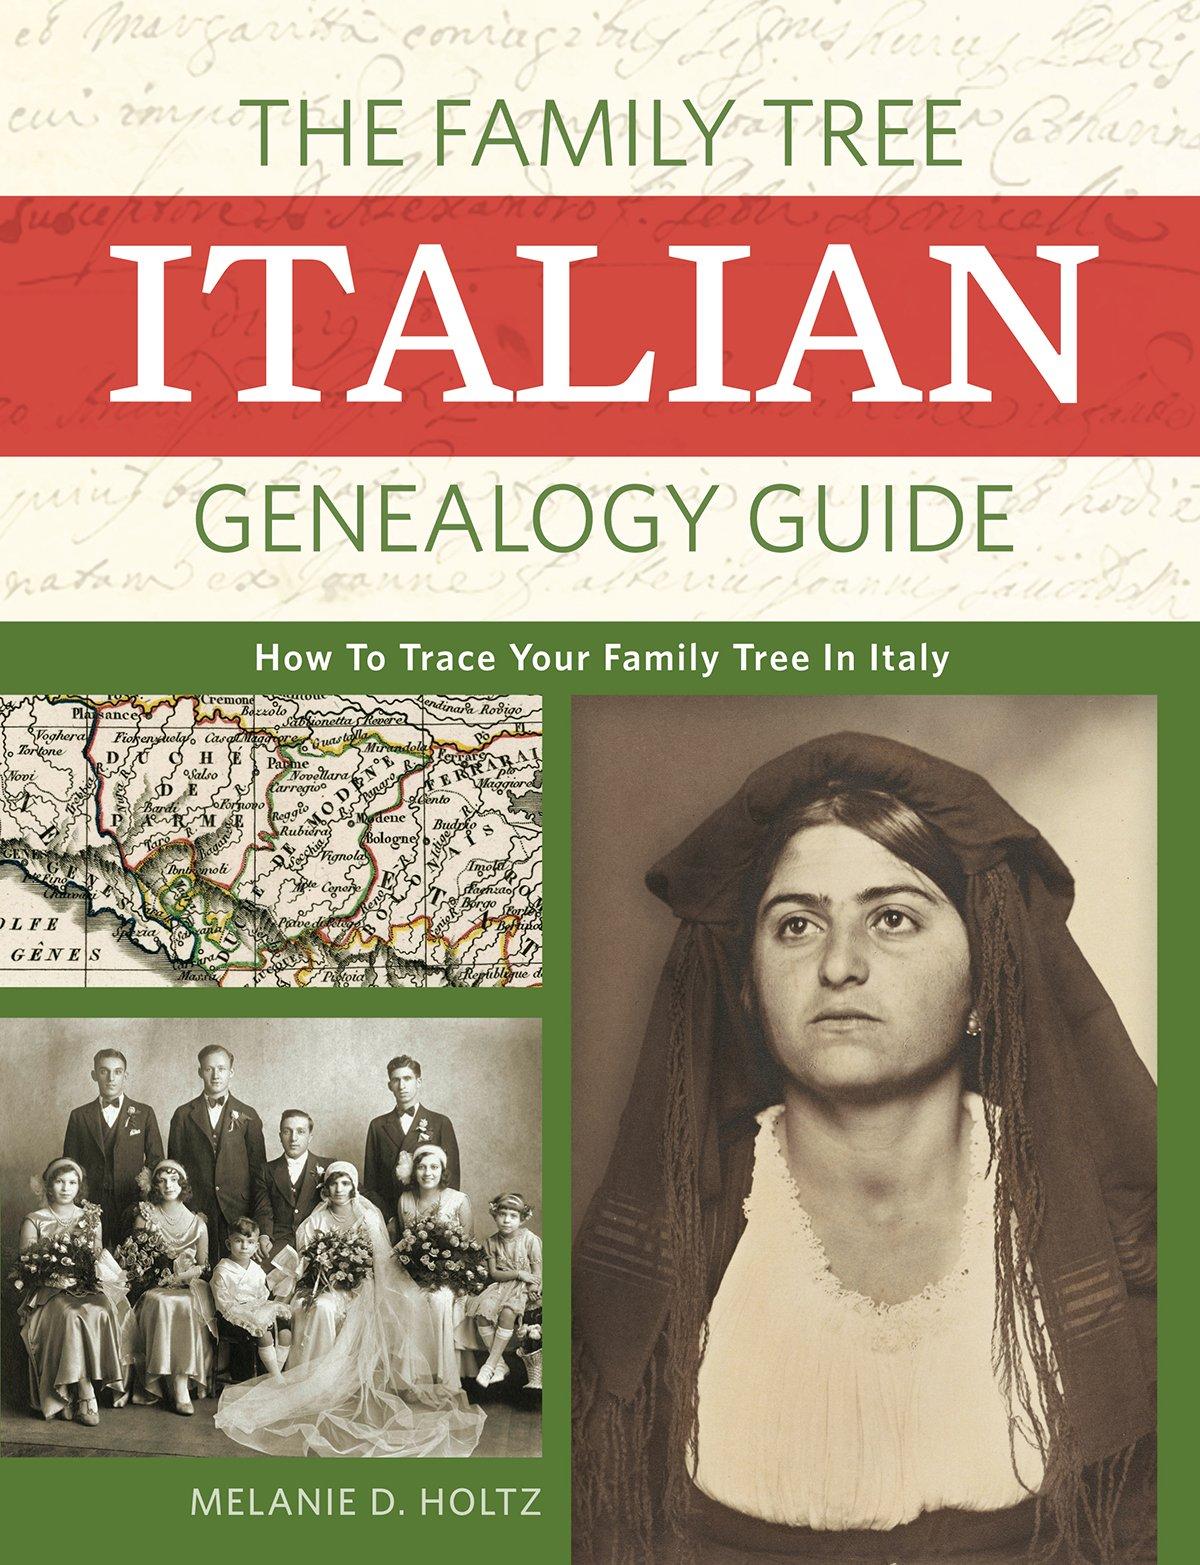 The Family Tree Italian Genealogy Guide: How to Trace Your Family Tree in  Italy: Melanie D Holtz: 9781440349058: Amazon.com: Books